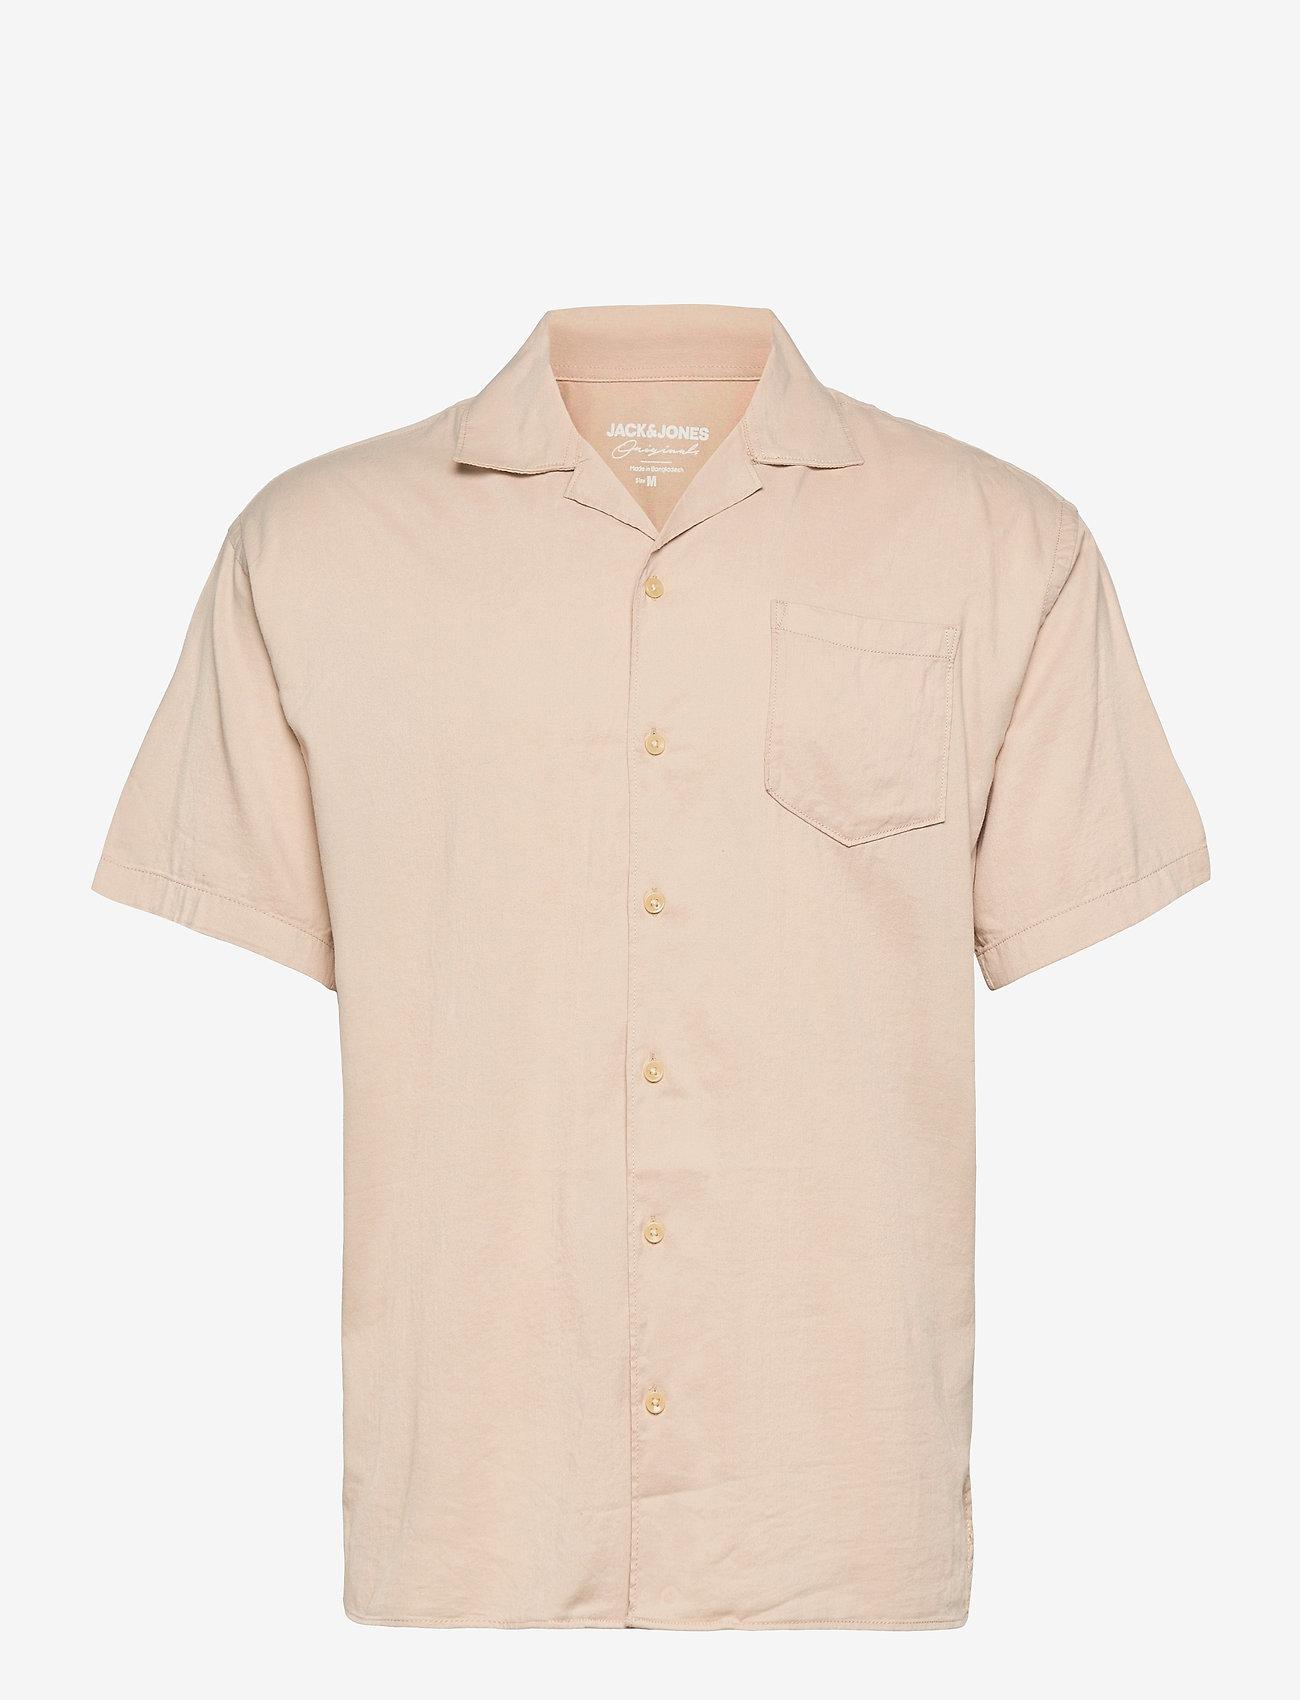 Jack & Jones - JORALEC SHIRT SS BLK - basic skjorter - crockery - 0